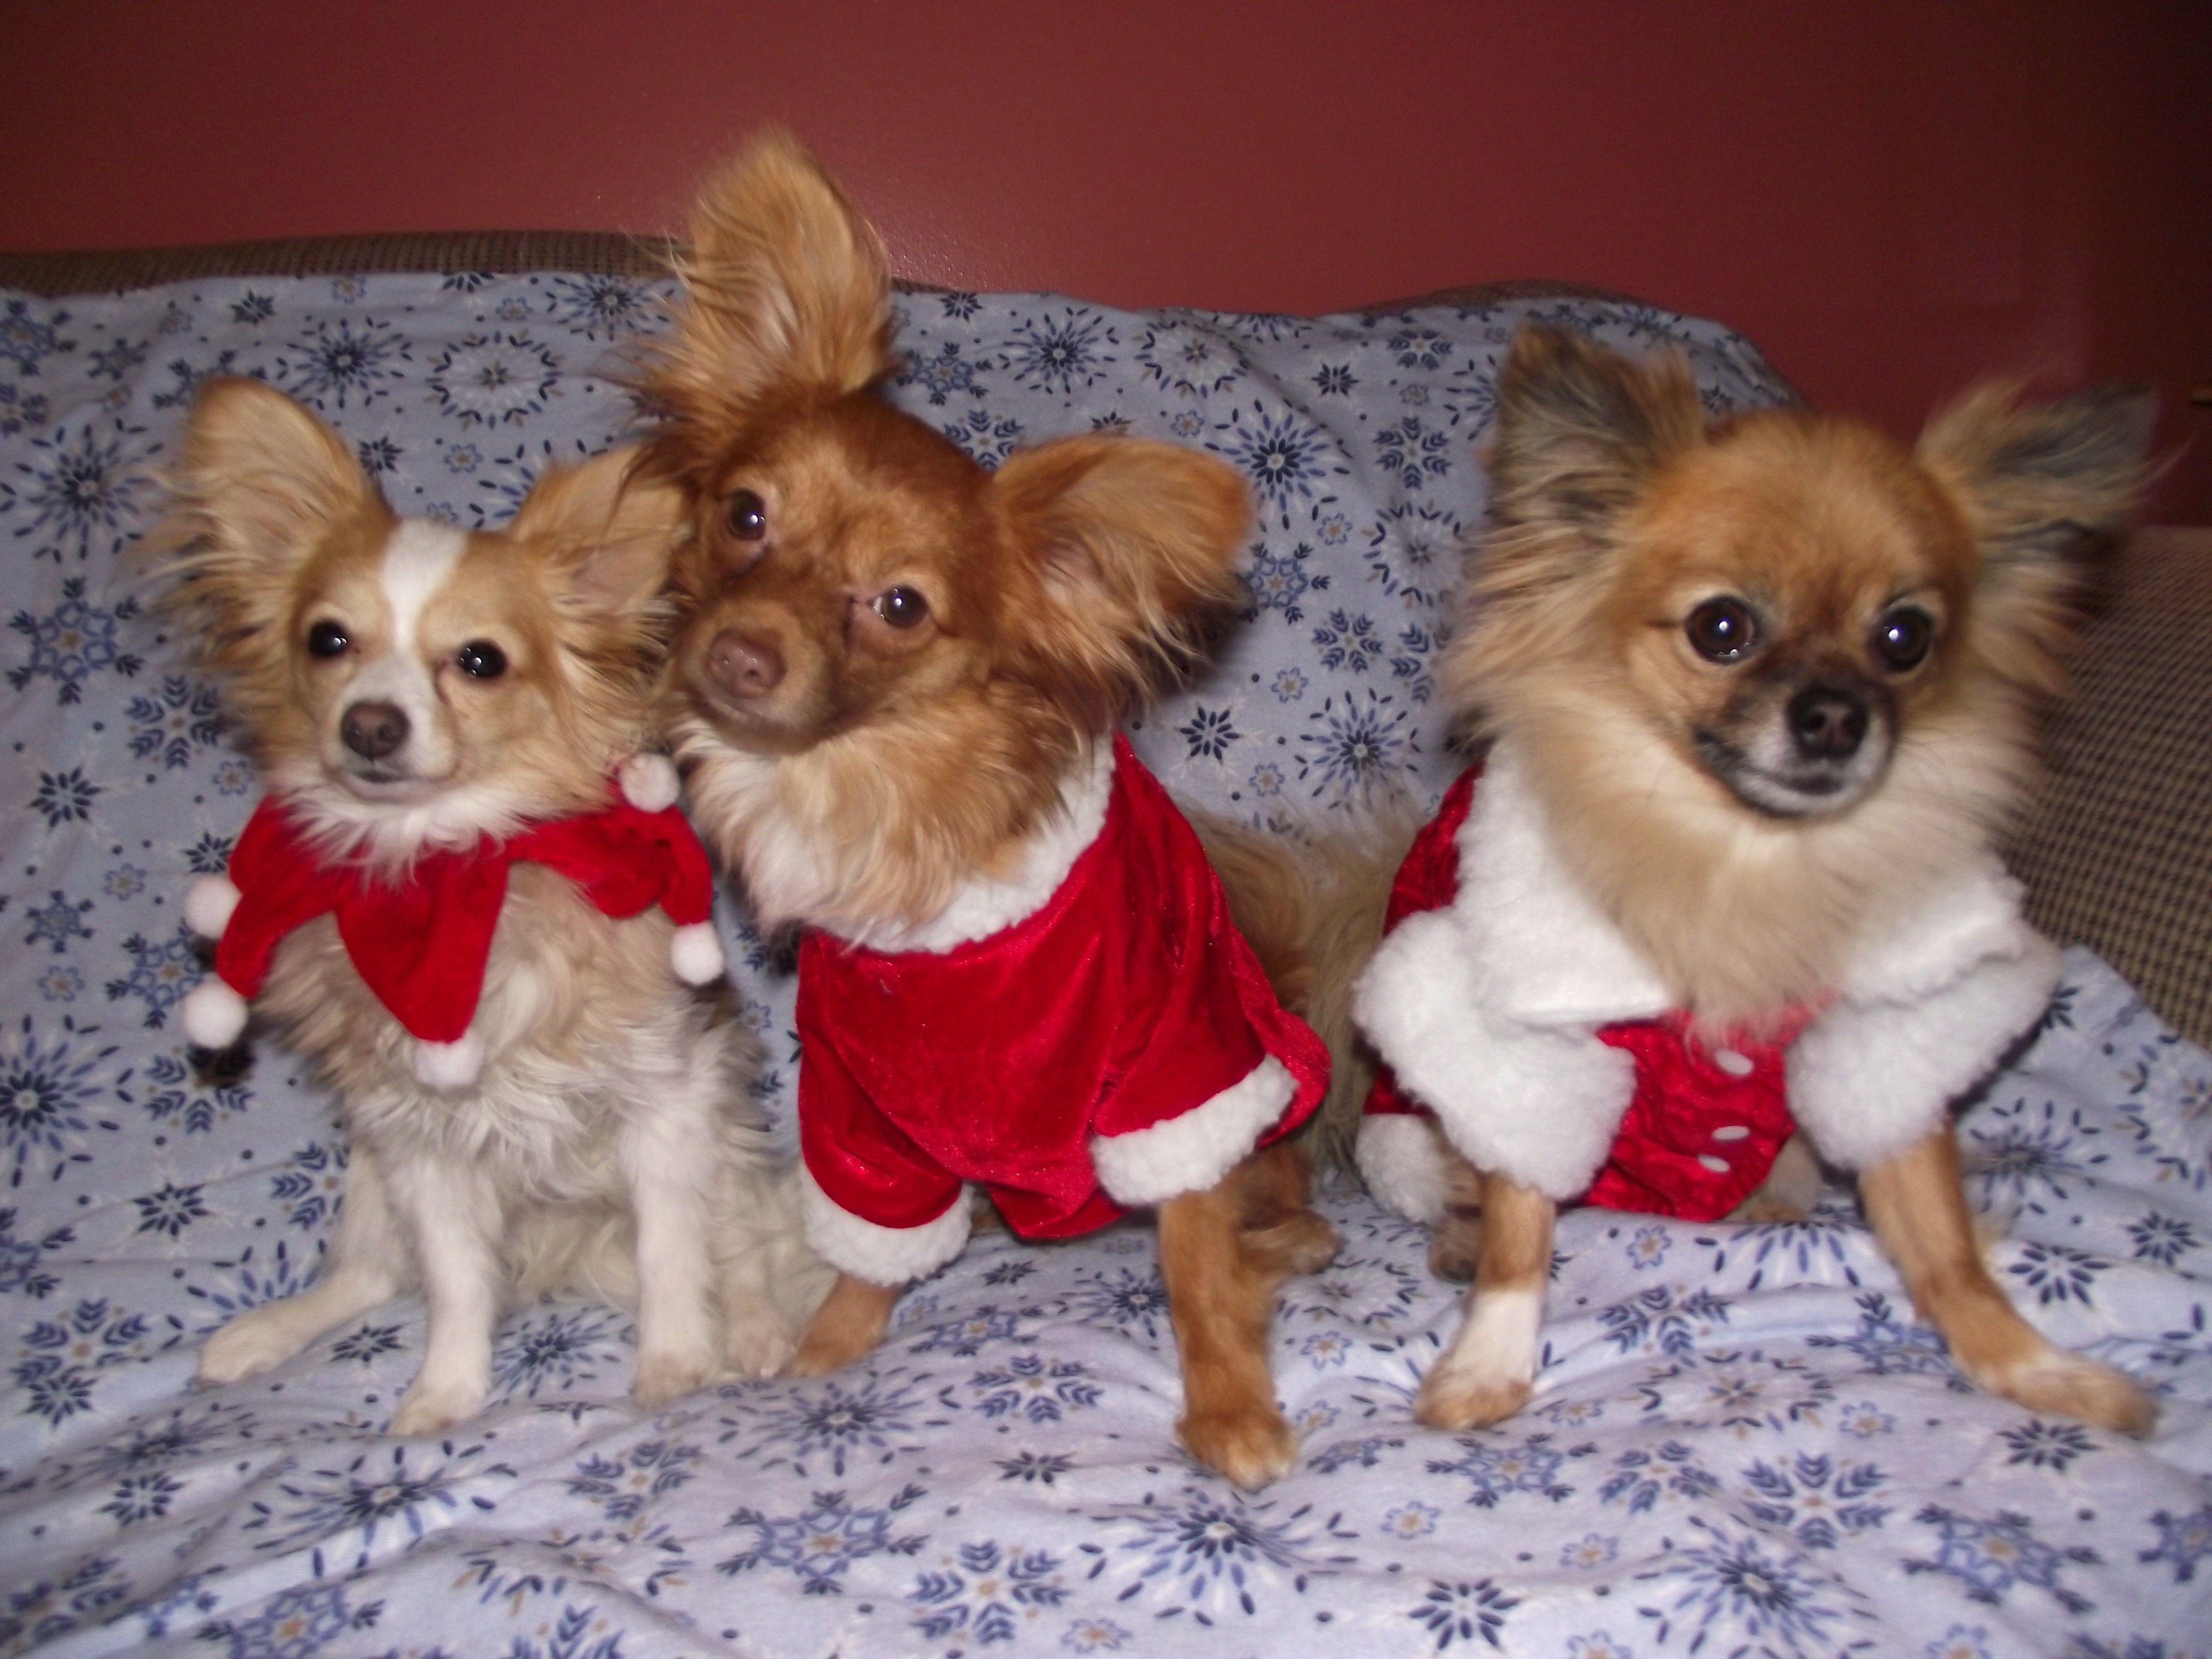 3 amigos santa paws christmas animals teacup chihuahua